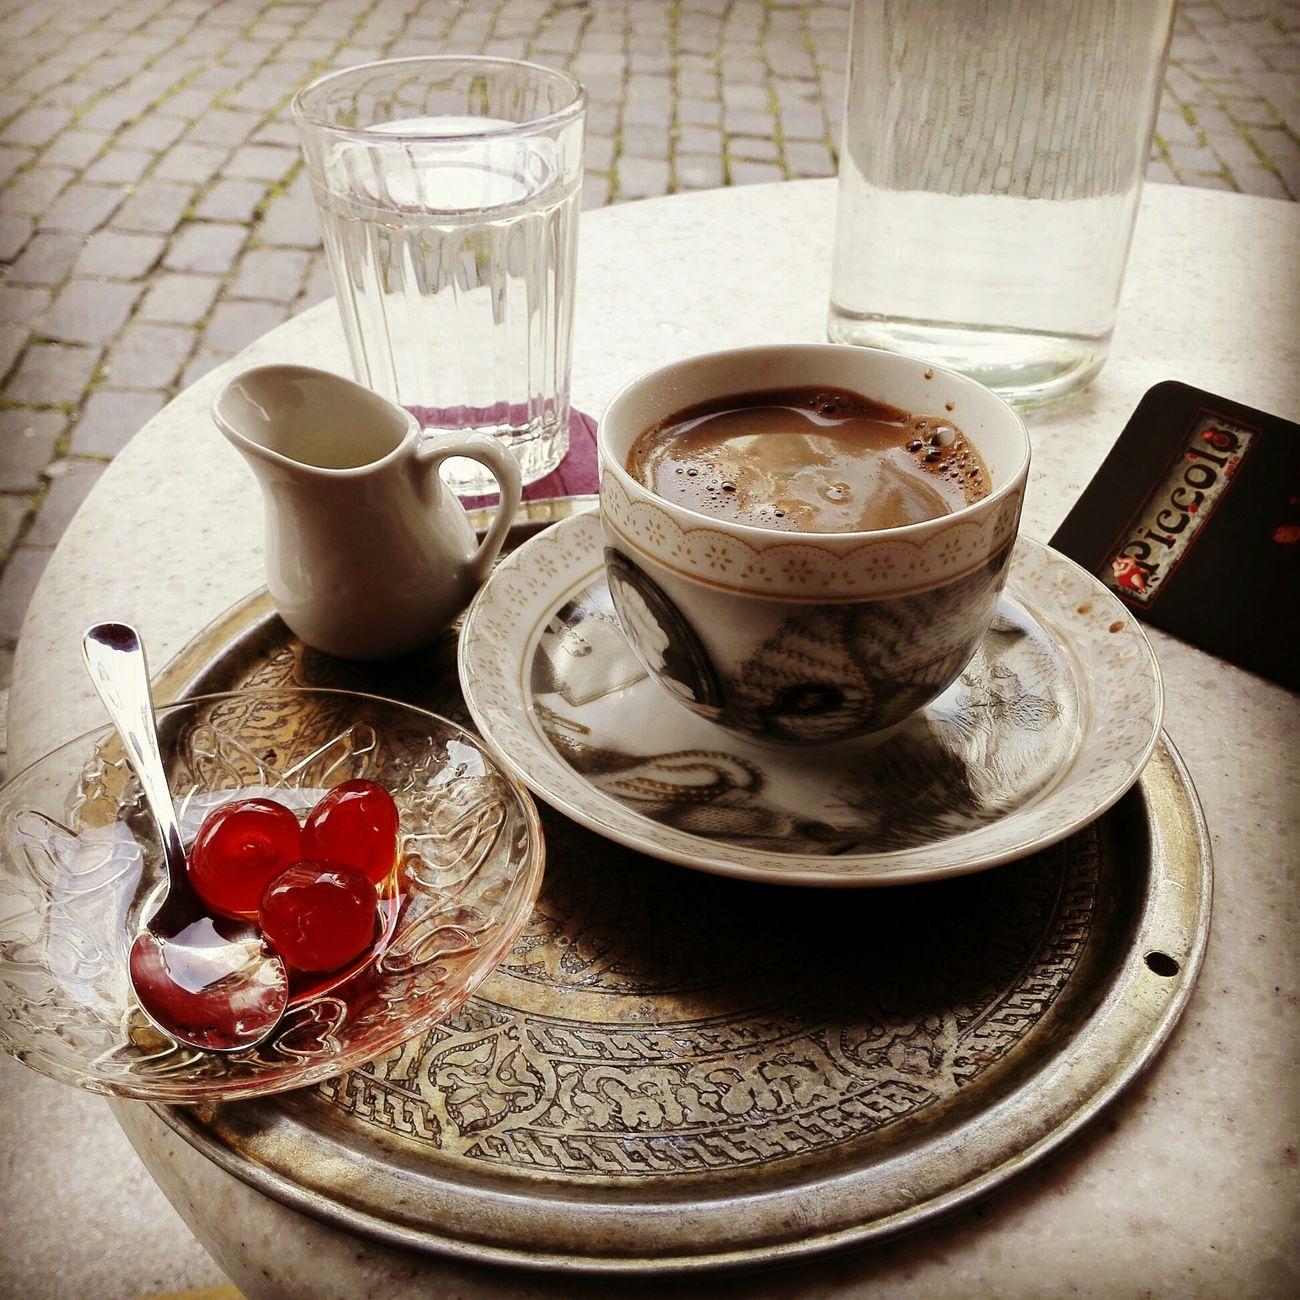 Greek Coffee  Sweet Good Morning World! Downtown Nice View